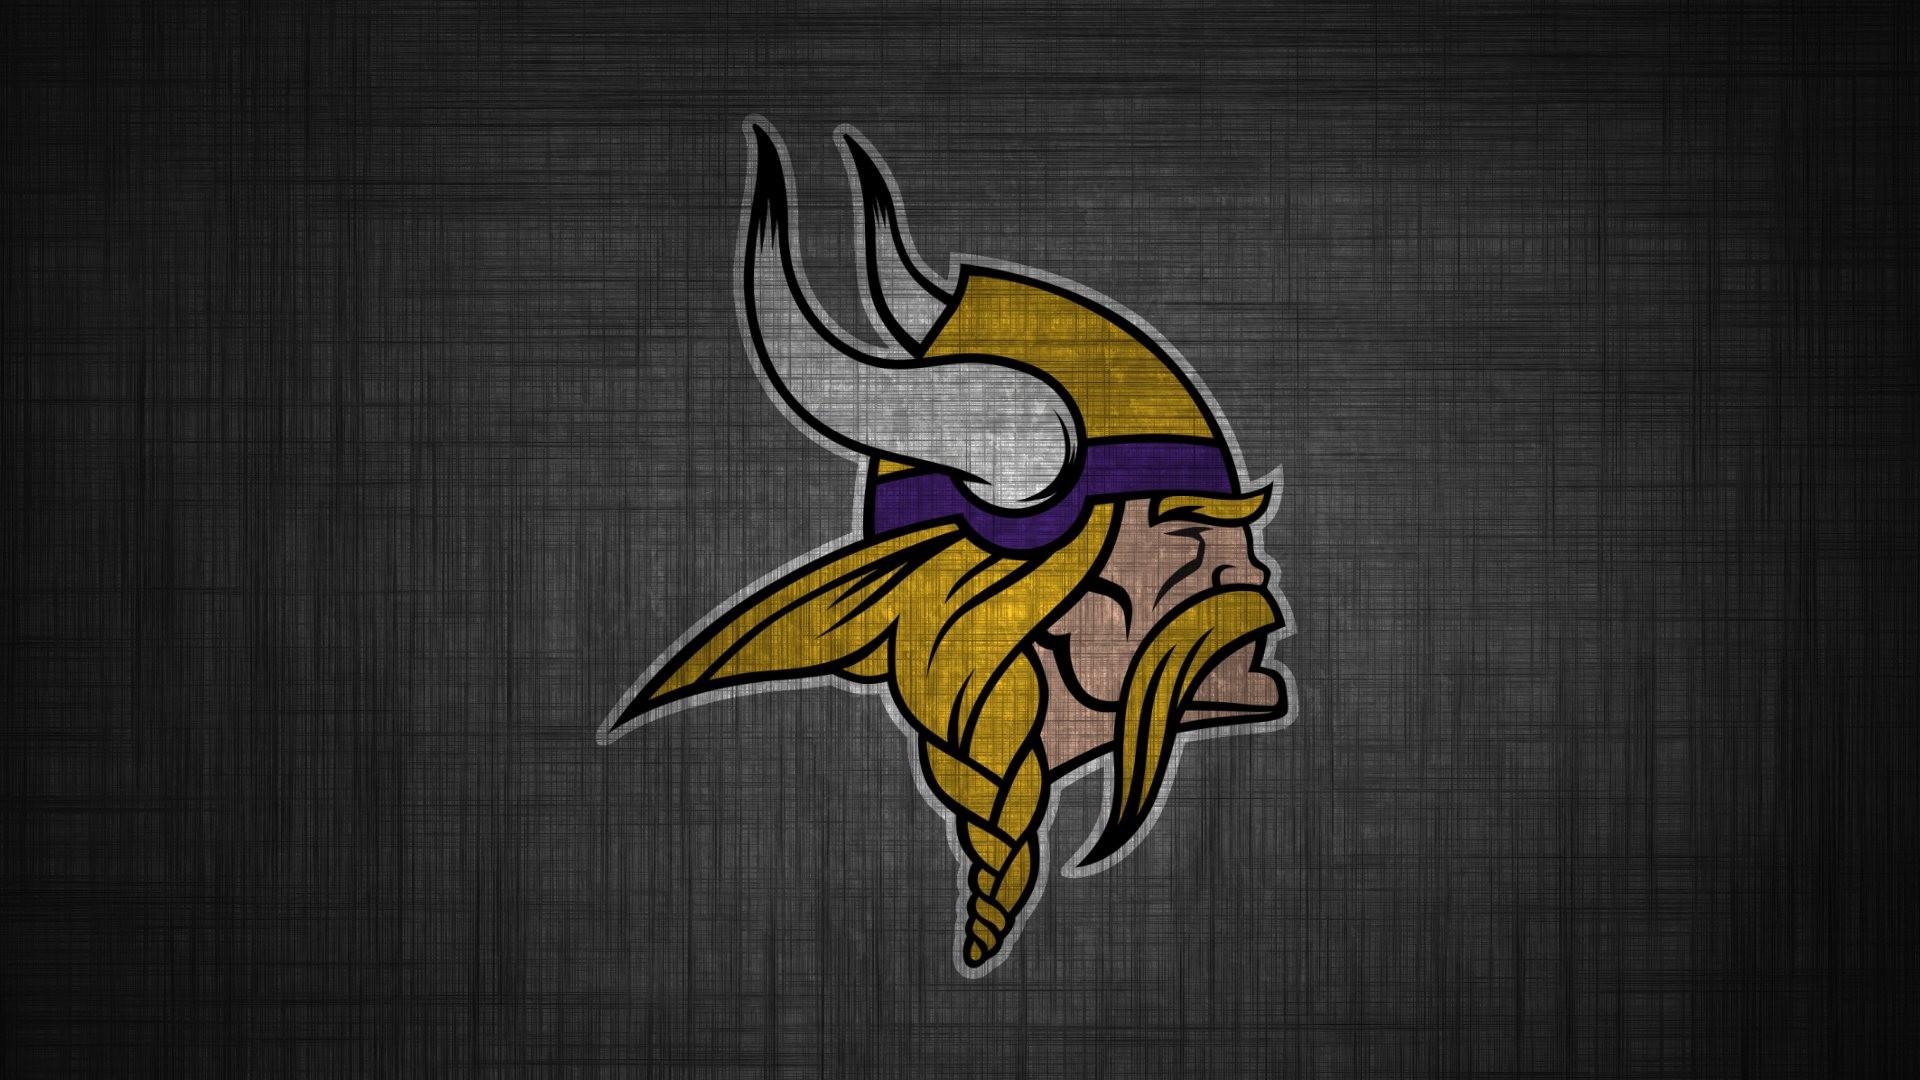 Download Vikings Football Wallpaper Gallery